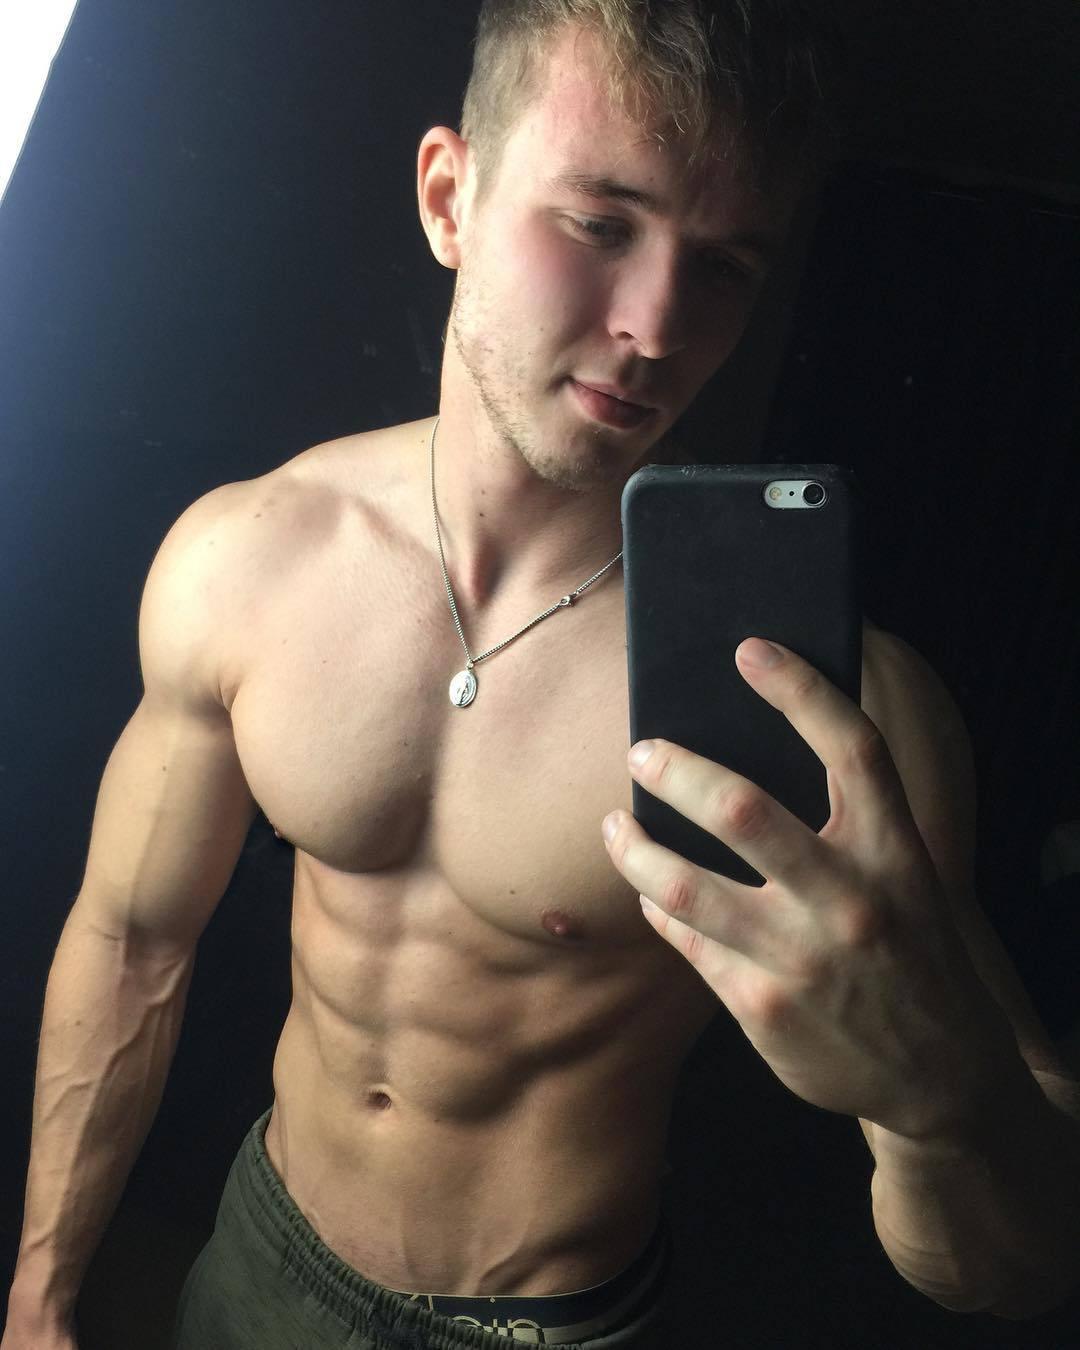 strong-cocky-bros-joe-dahler-shirtless-muscular-selfie